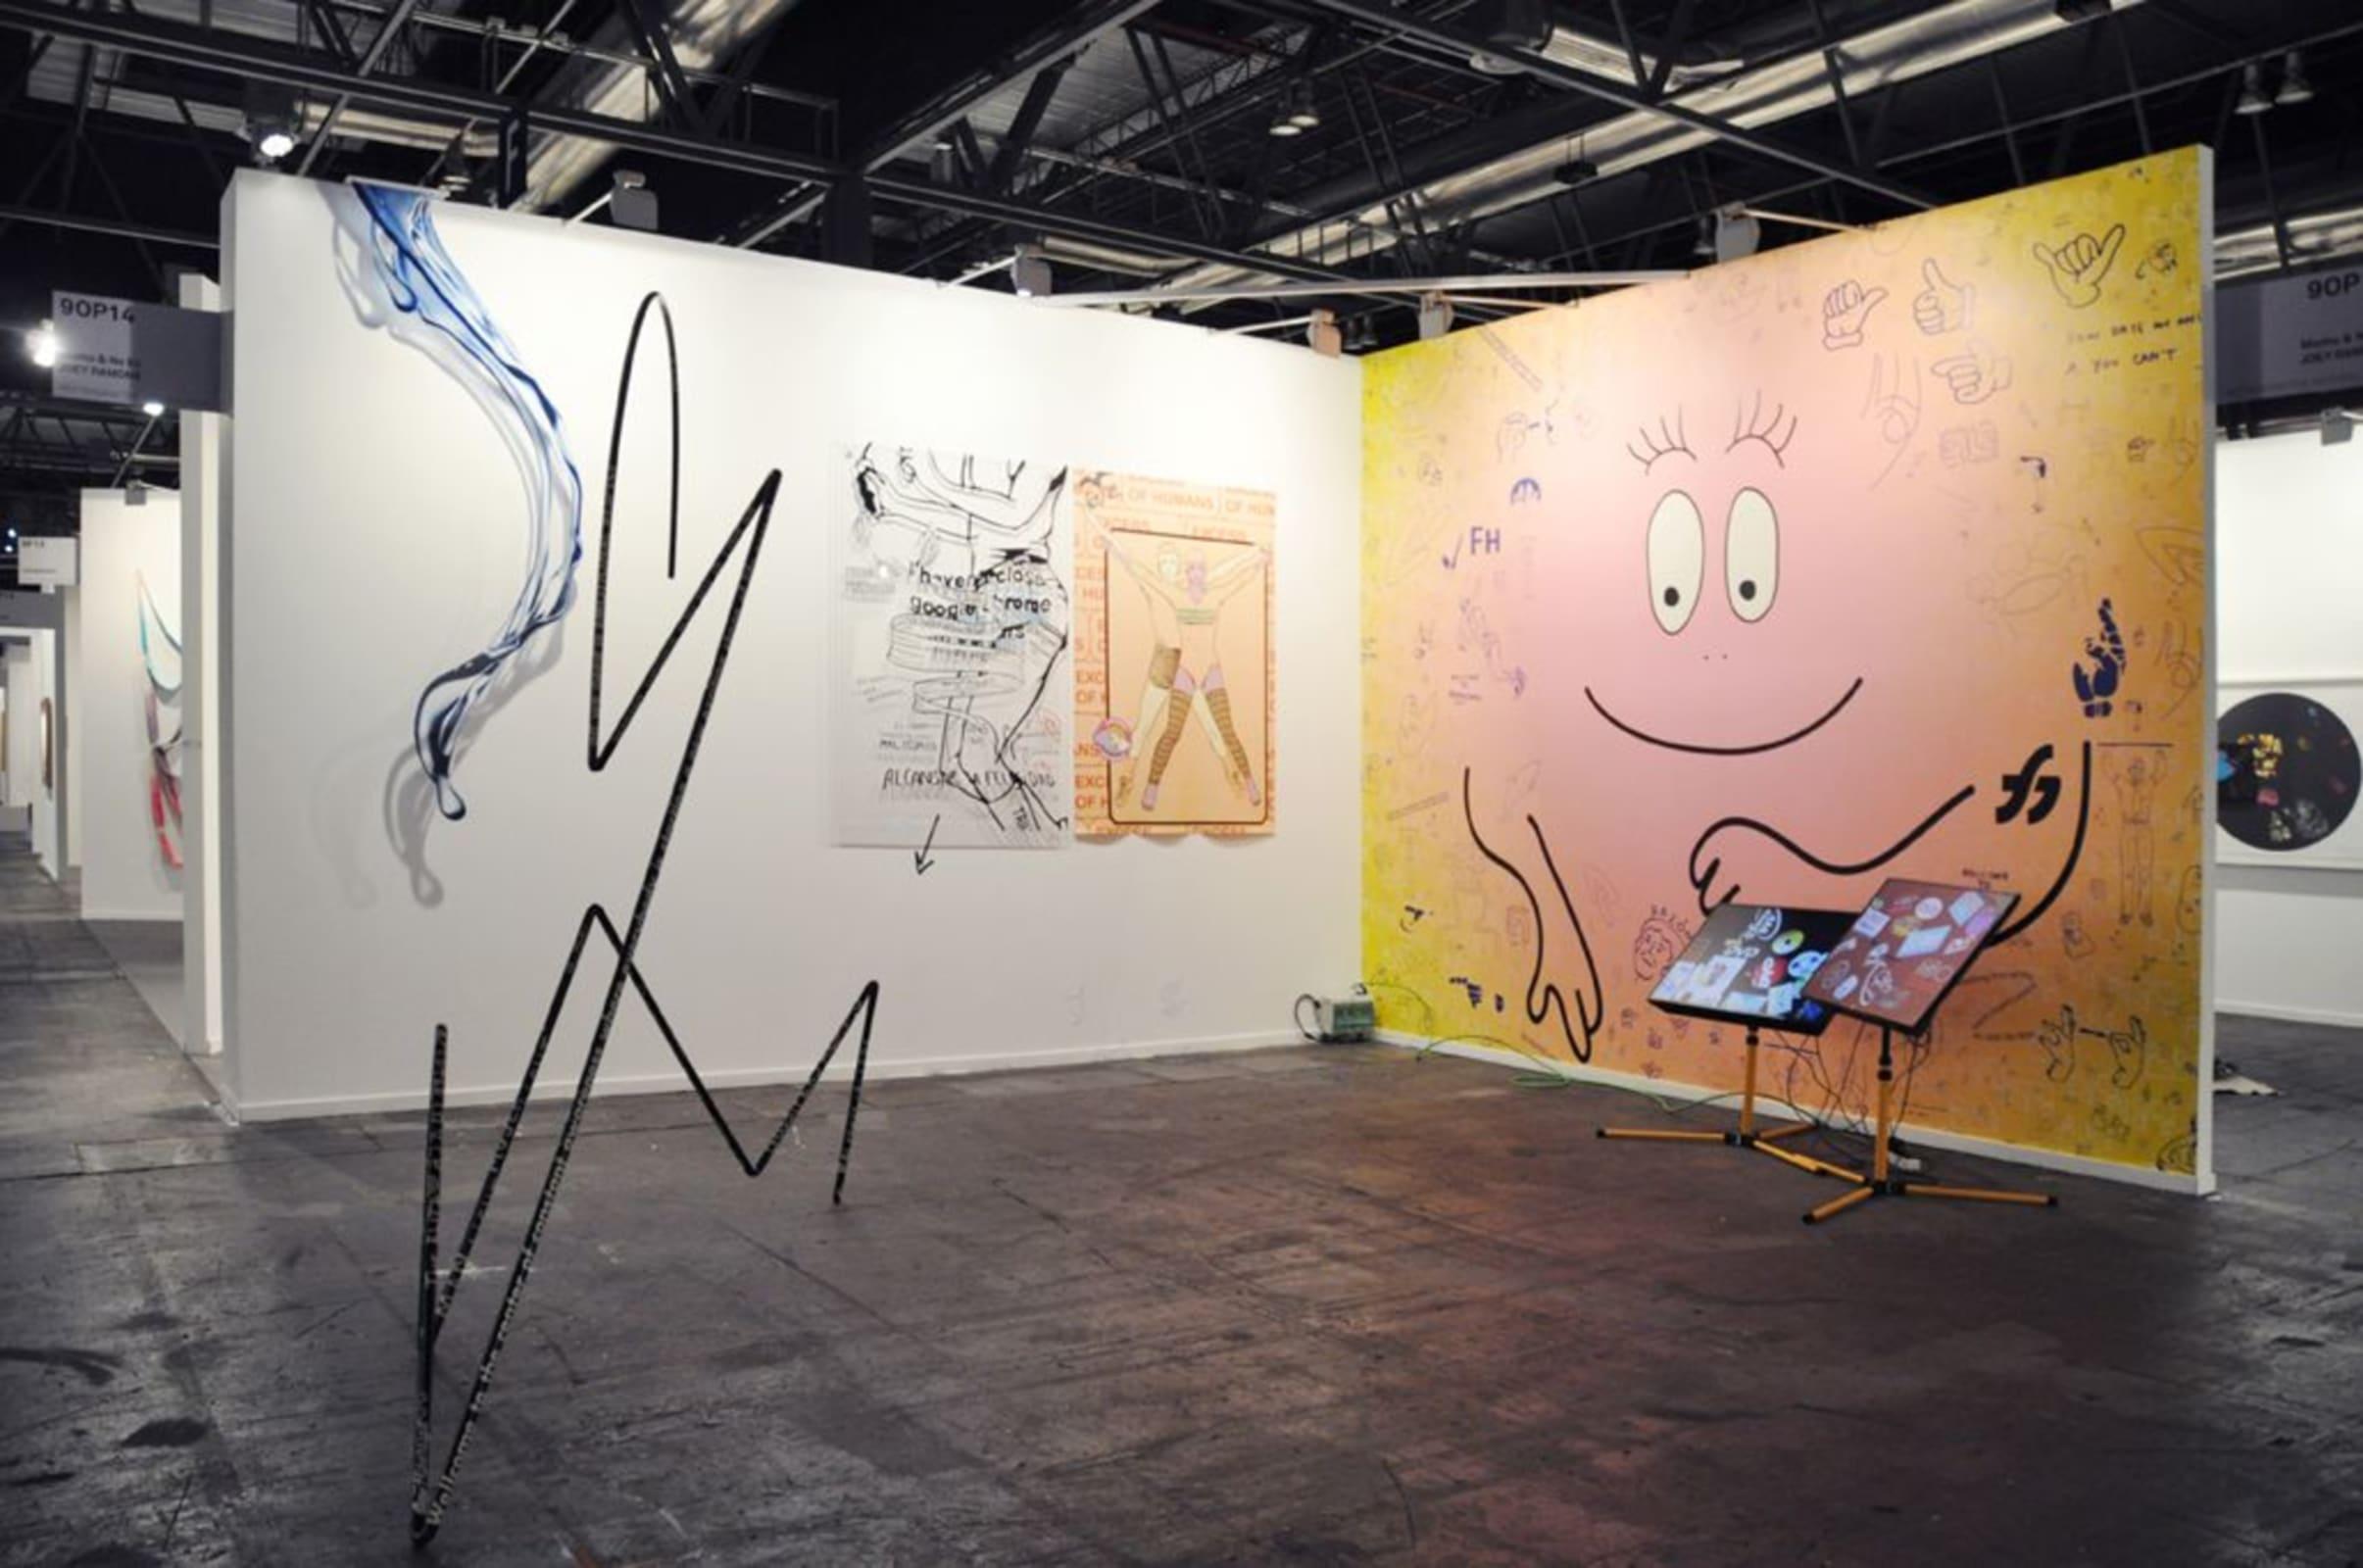 Art Rotterdam 2019, Momu & No Es,